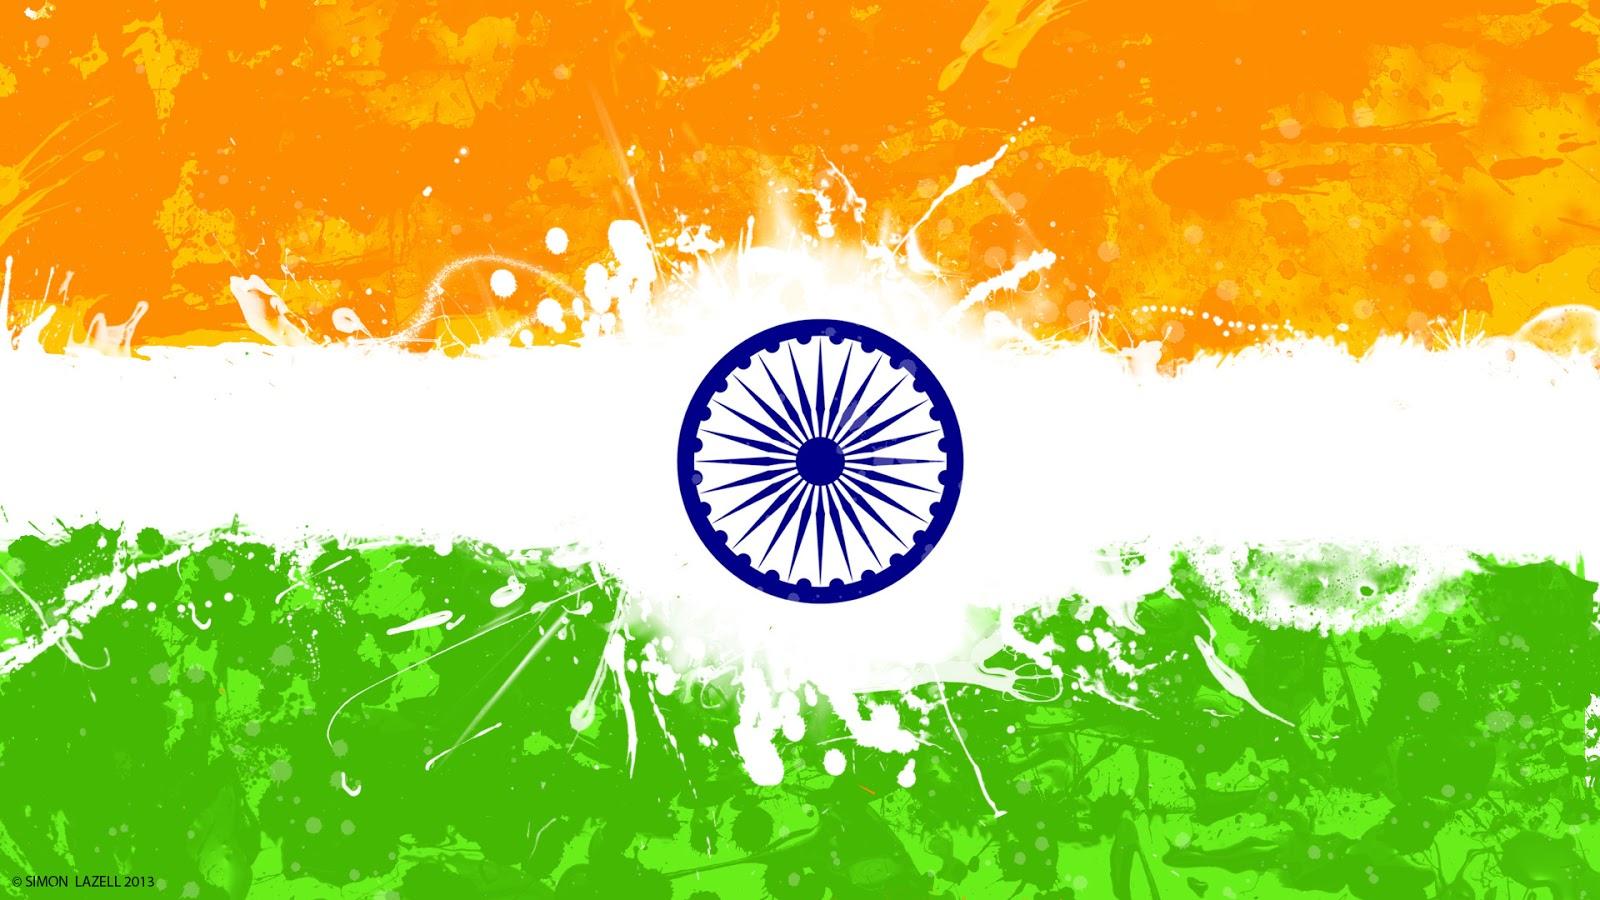 rajbhasha hindi contribution on nation Every year president present the rajbhasha awards at hindi diwas 2017 : take pride in speaking hindi diwas 2017 : take pride in speaking 'hindi.